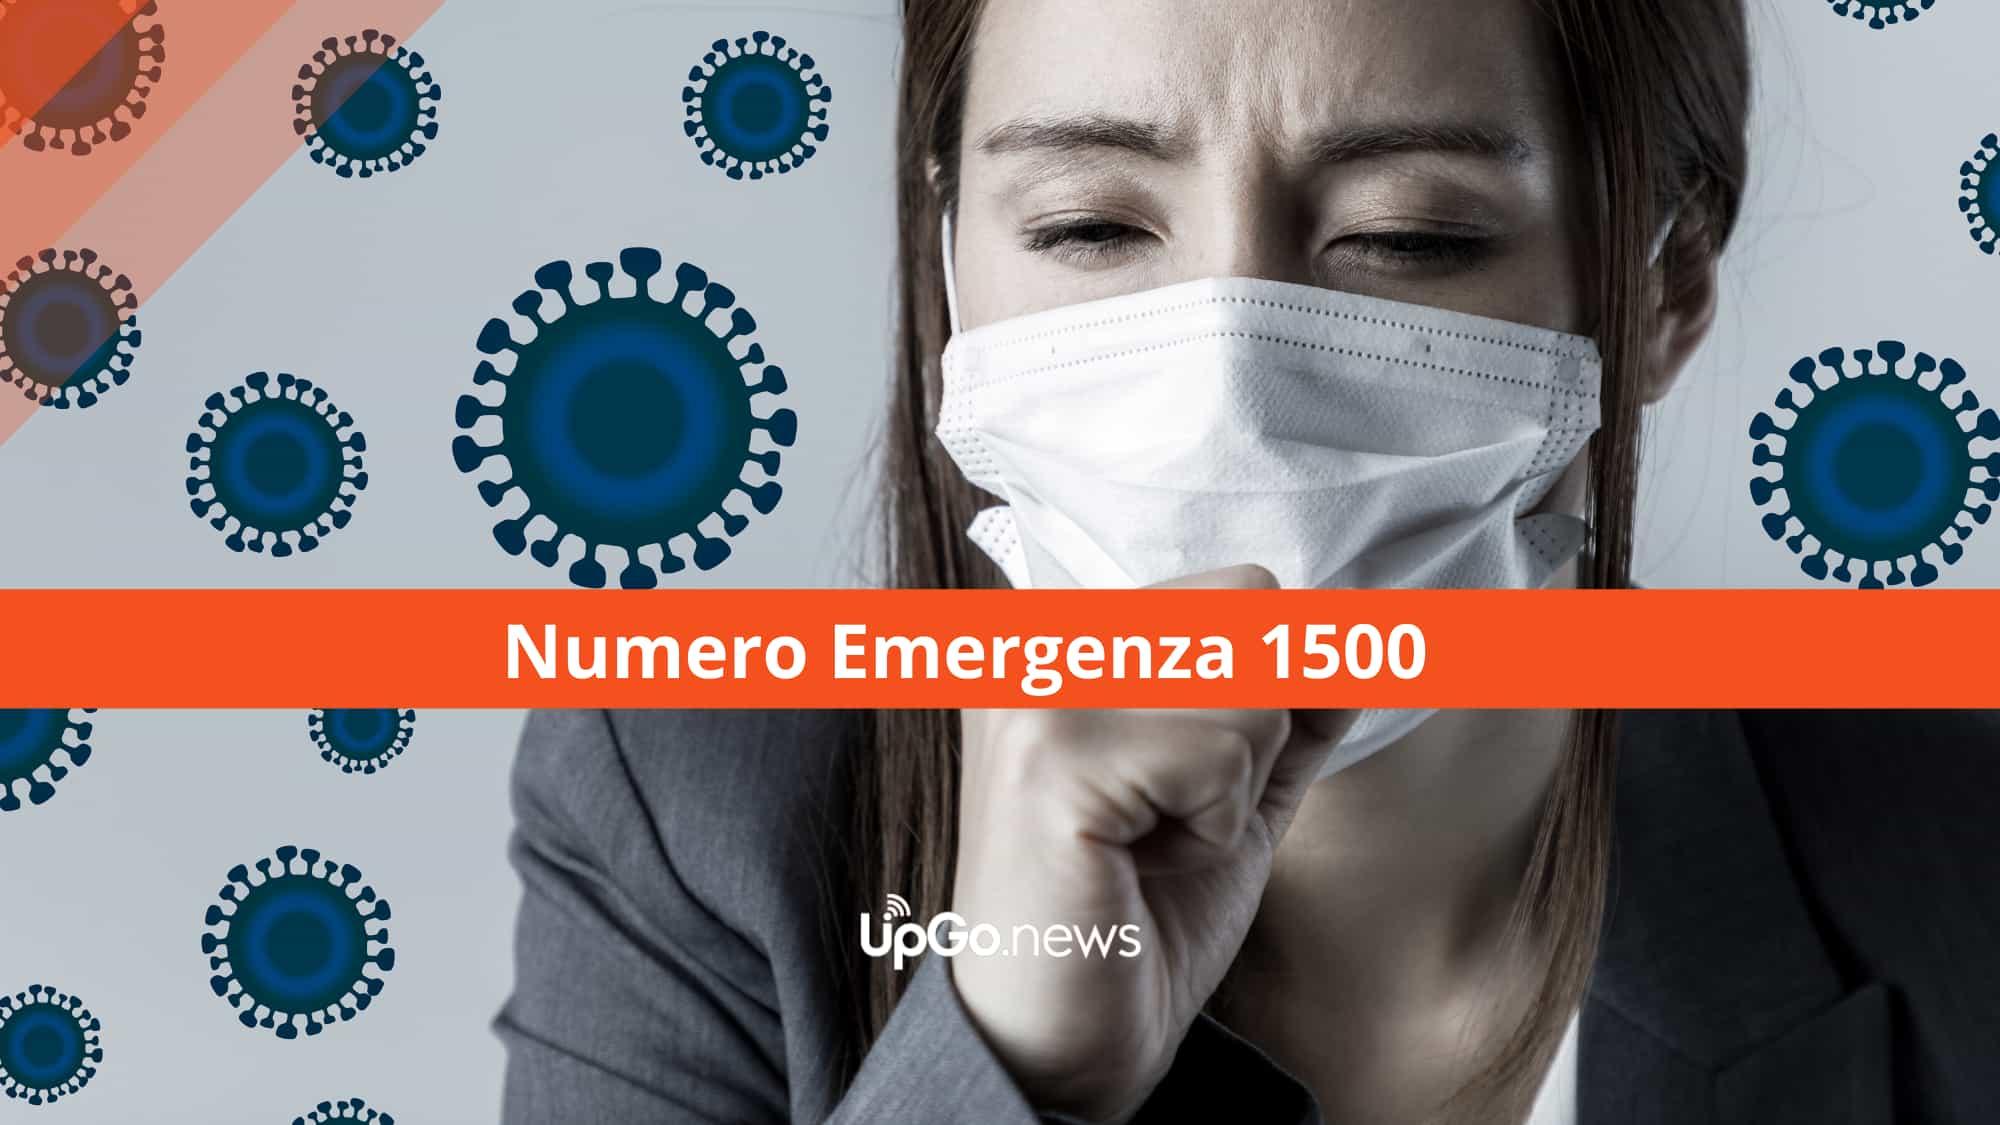 Numero Emergenza 1500